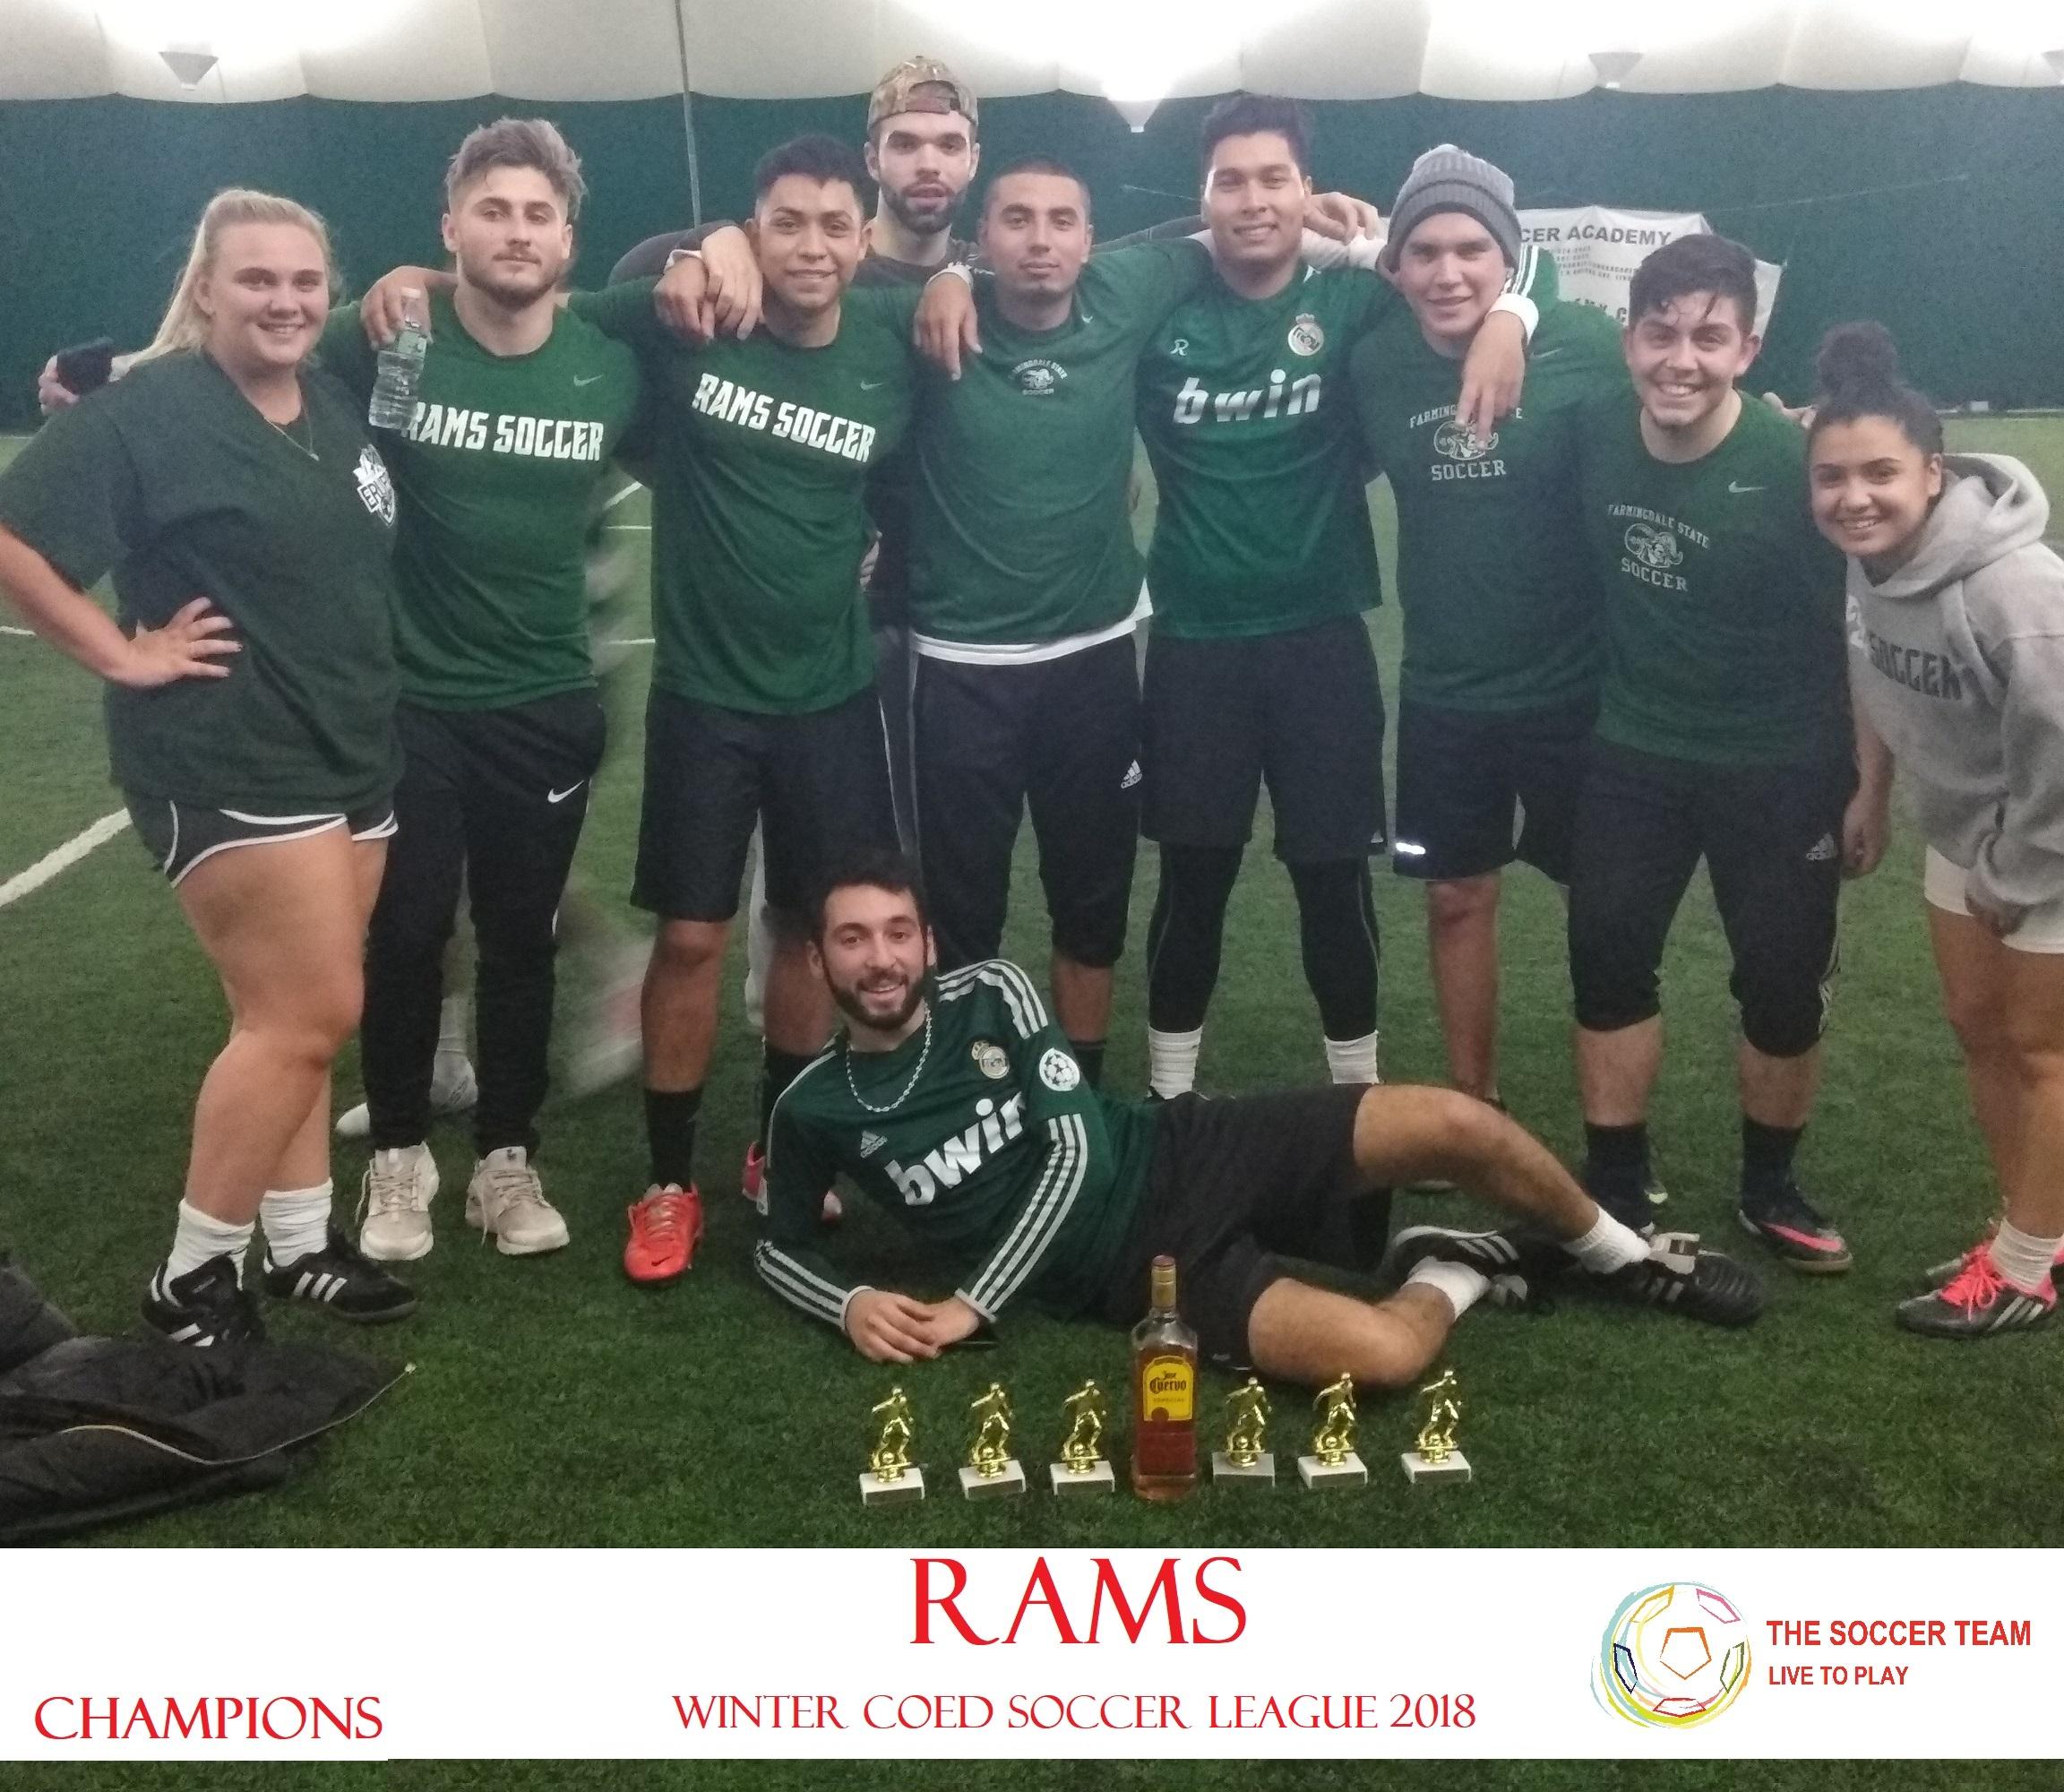 RAMS CHAMPIONS